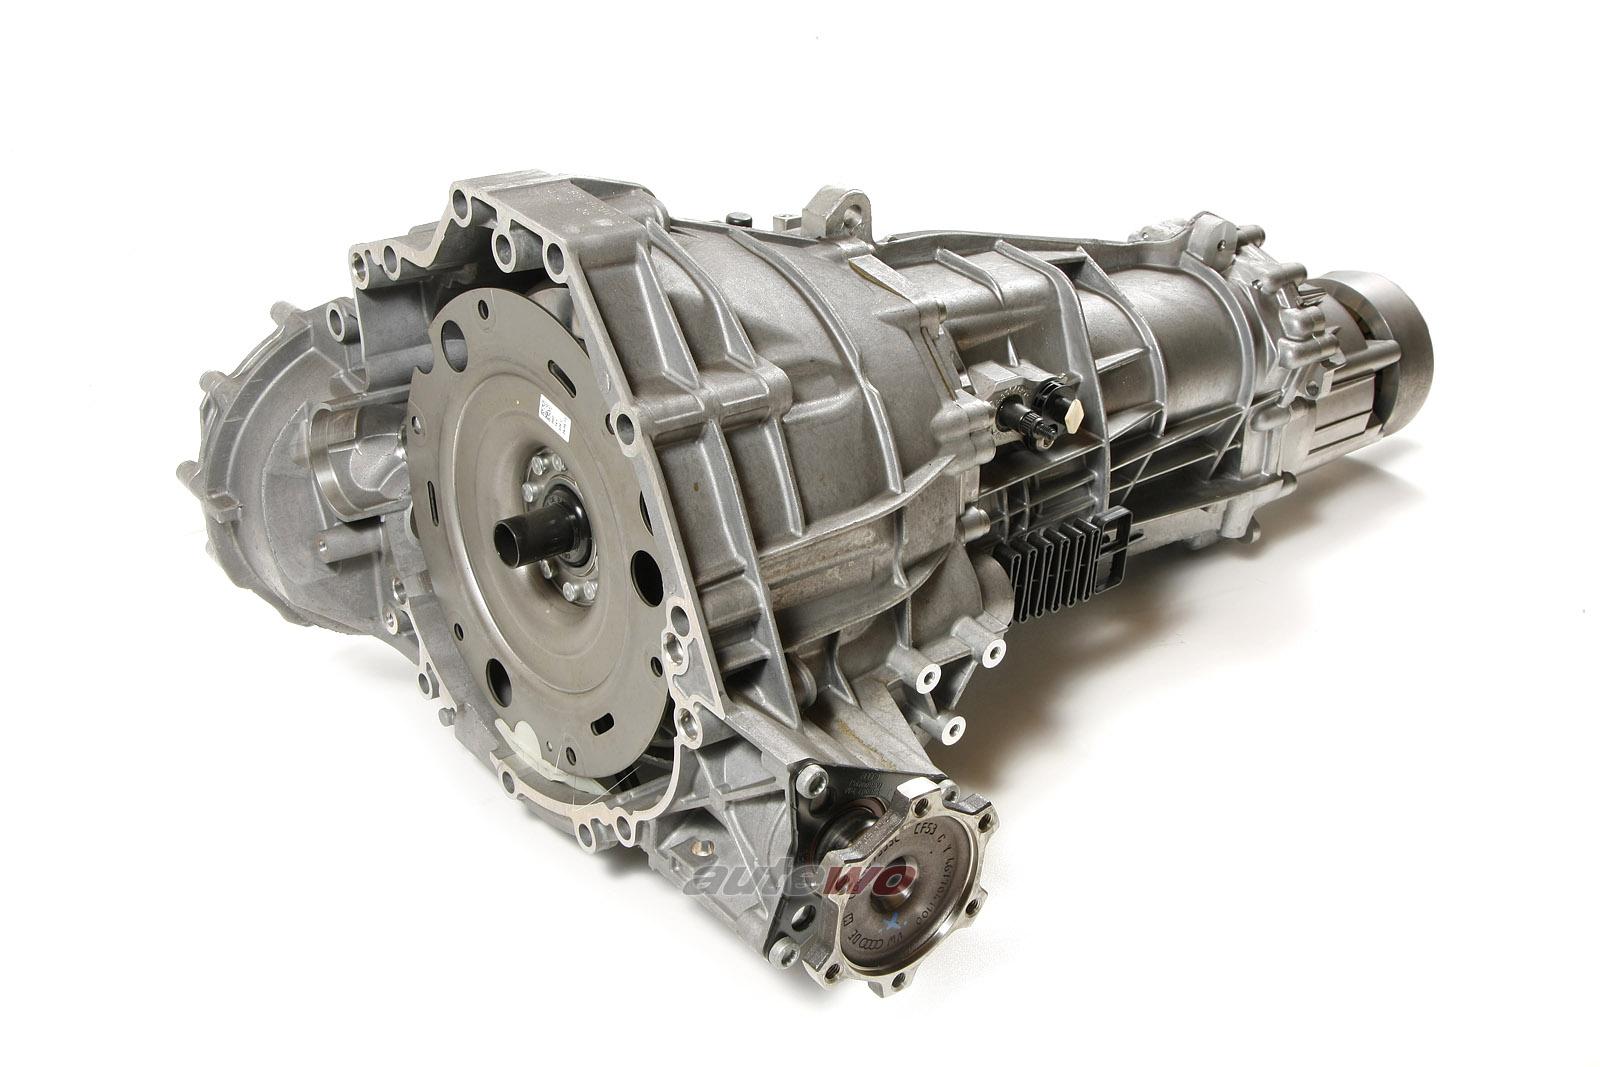 0B2300028J 0B2300042K NEU Audi Q5 8R 2.0lTFSI 6-Gang-Schaltgetriebe Quattro LSB